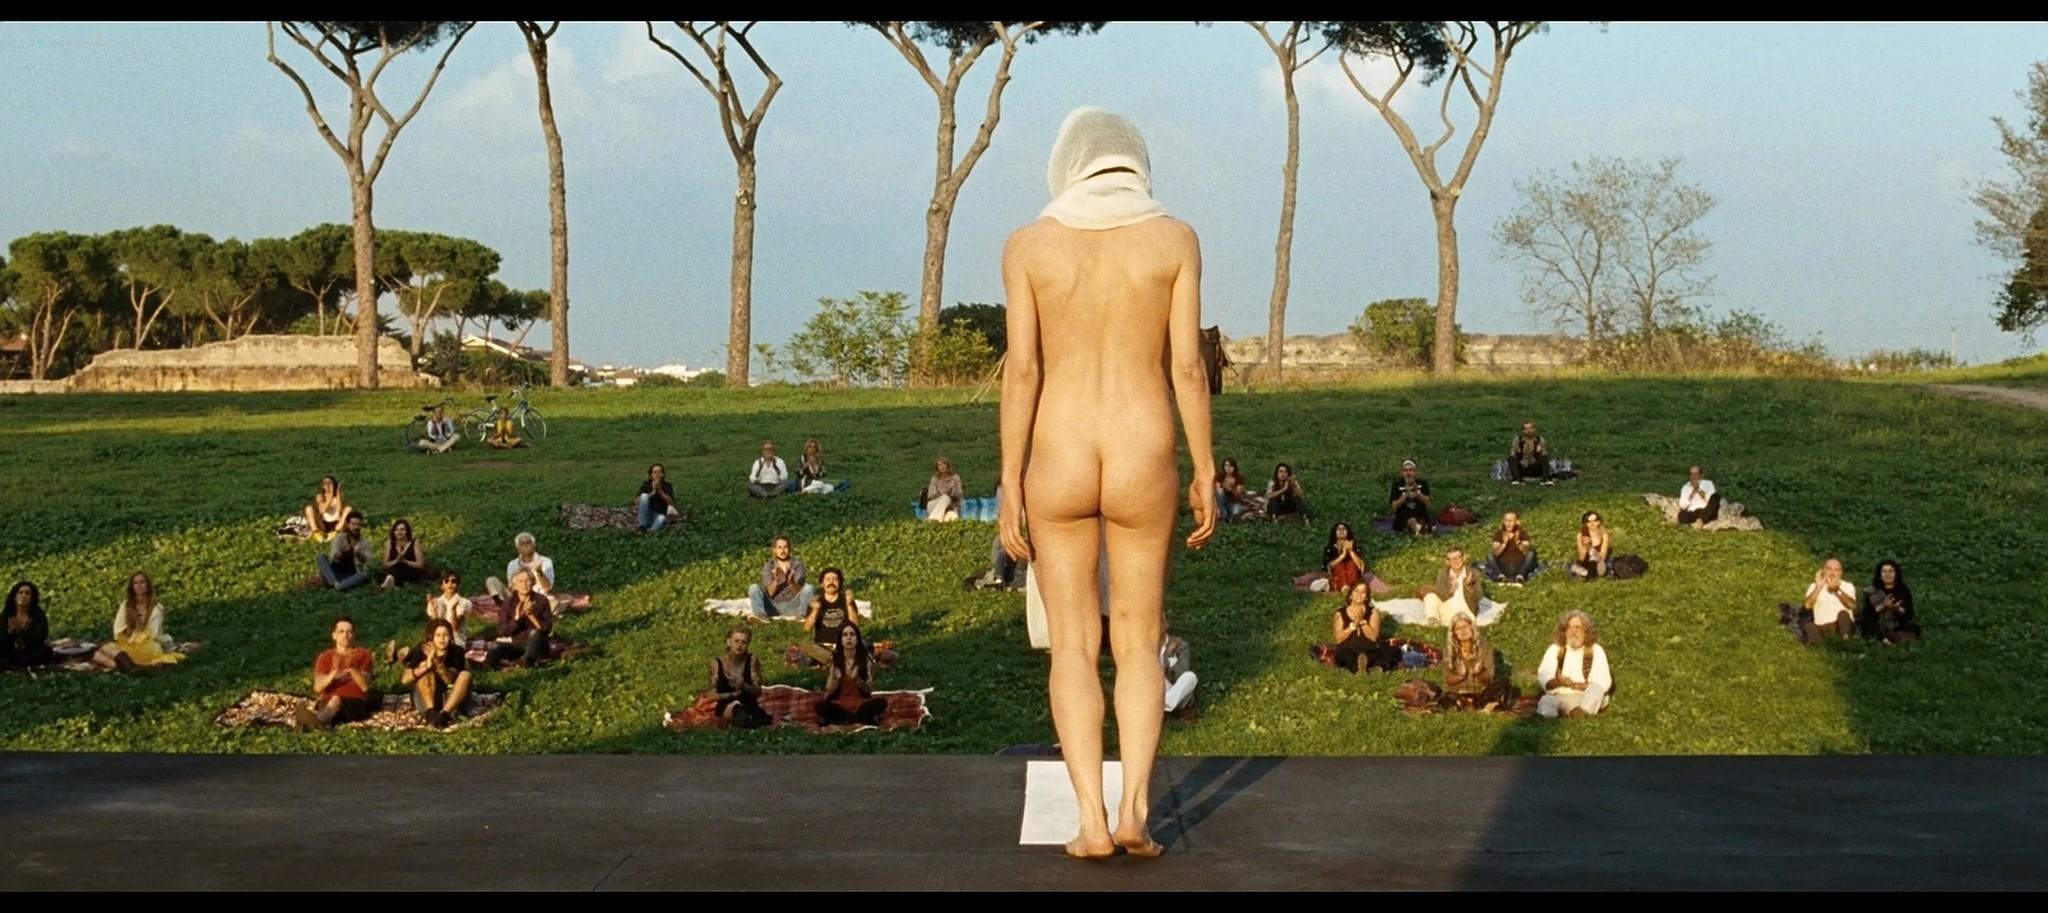 Sabrina Ferilli nude Anita Kravos full frontal Galatea Ranzi and others nude and sexy The Great Beauty IT 2013 1080p BluRey 6